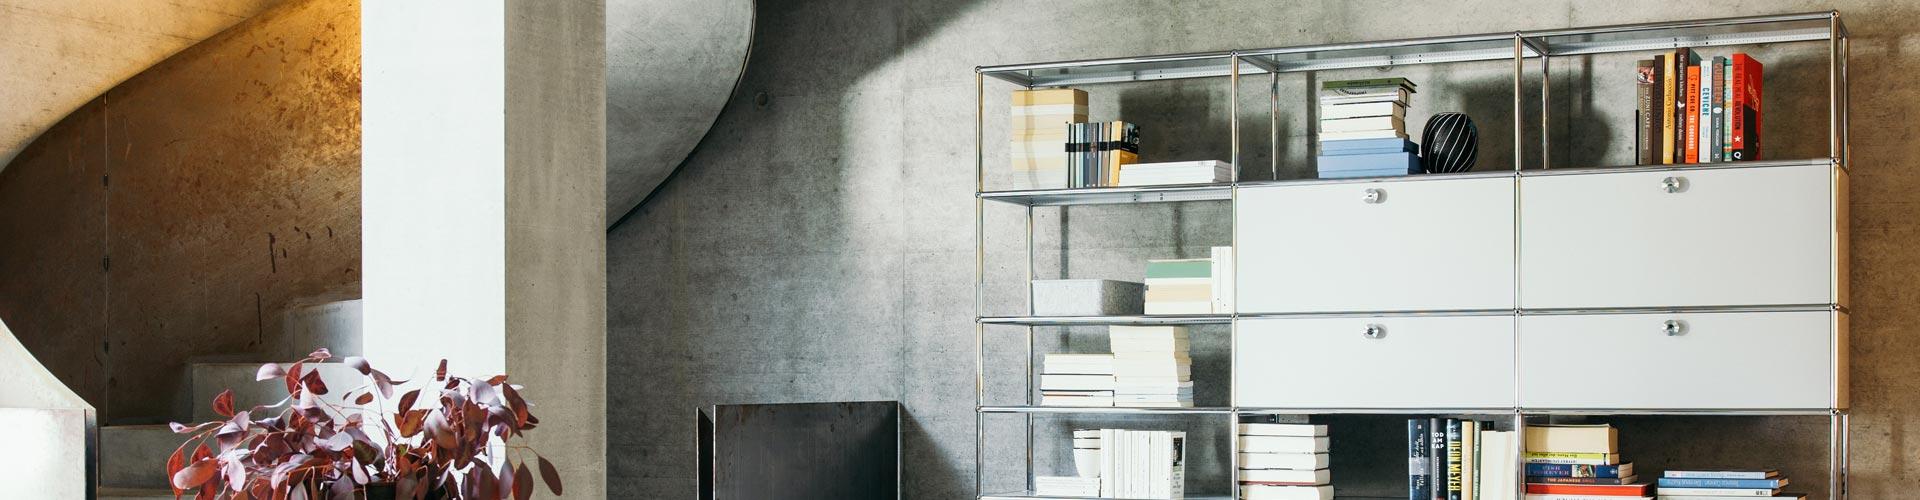 Tolle Büromöbel Rosenheim Ideen - Hauptinnenideen - kakados.com